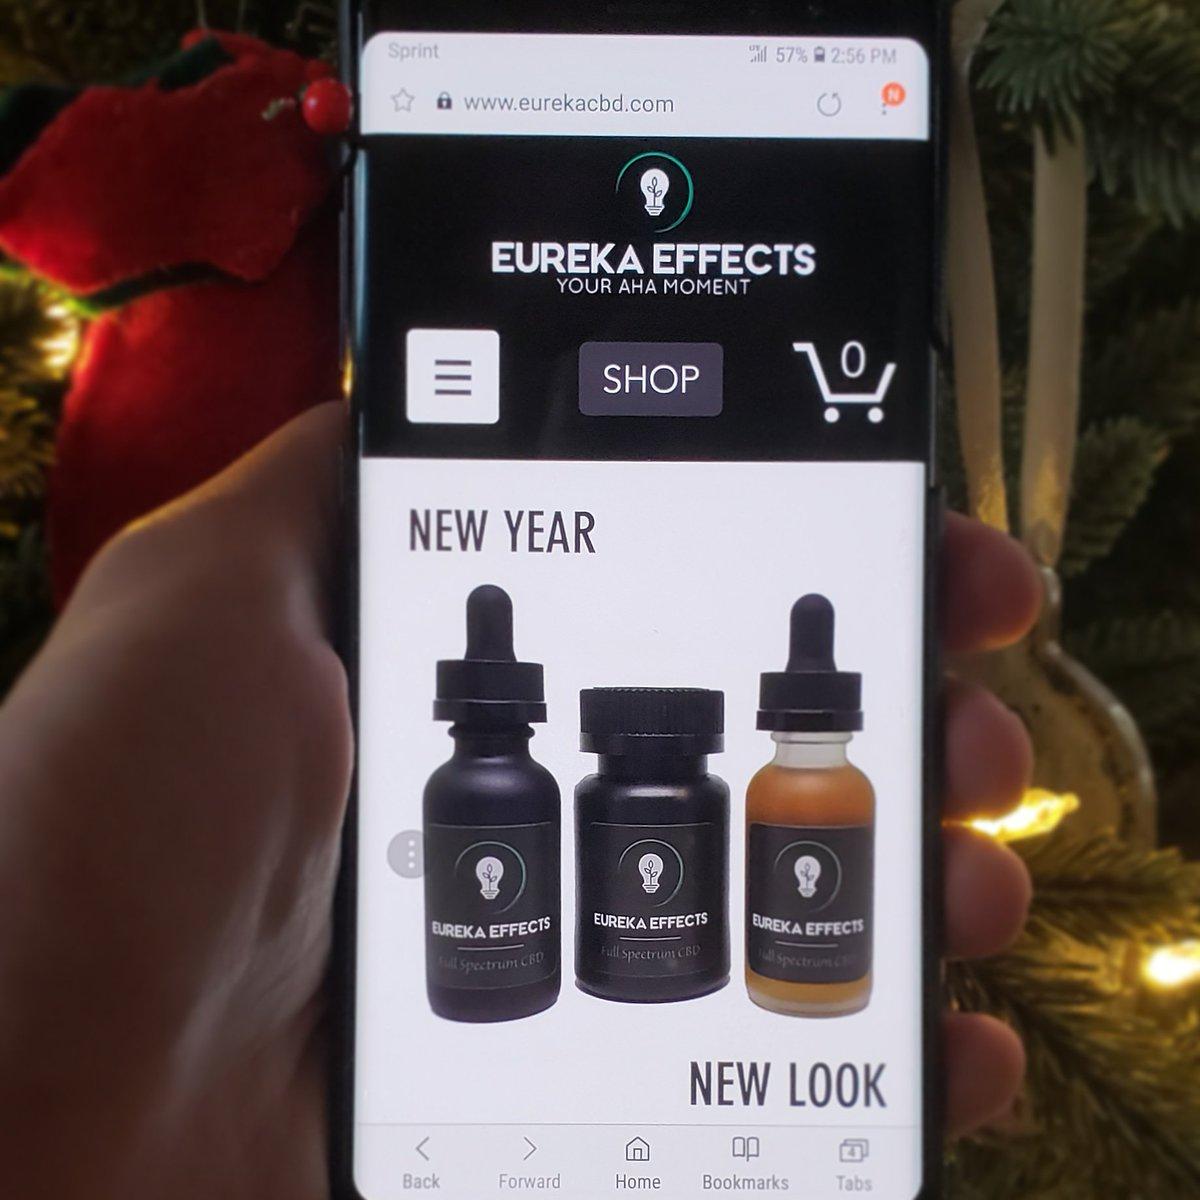 eureka effects full spectrum cbd